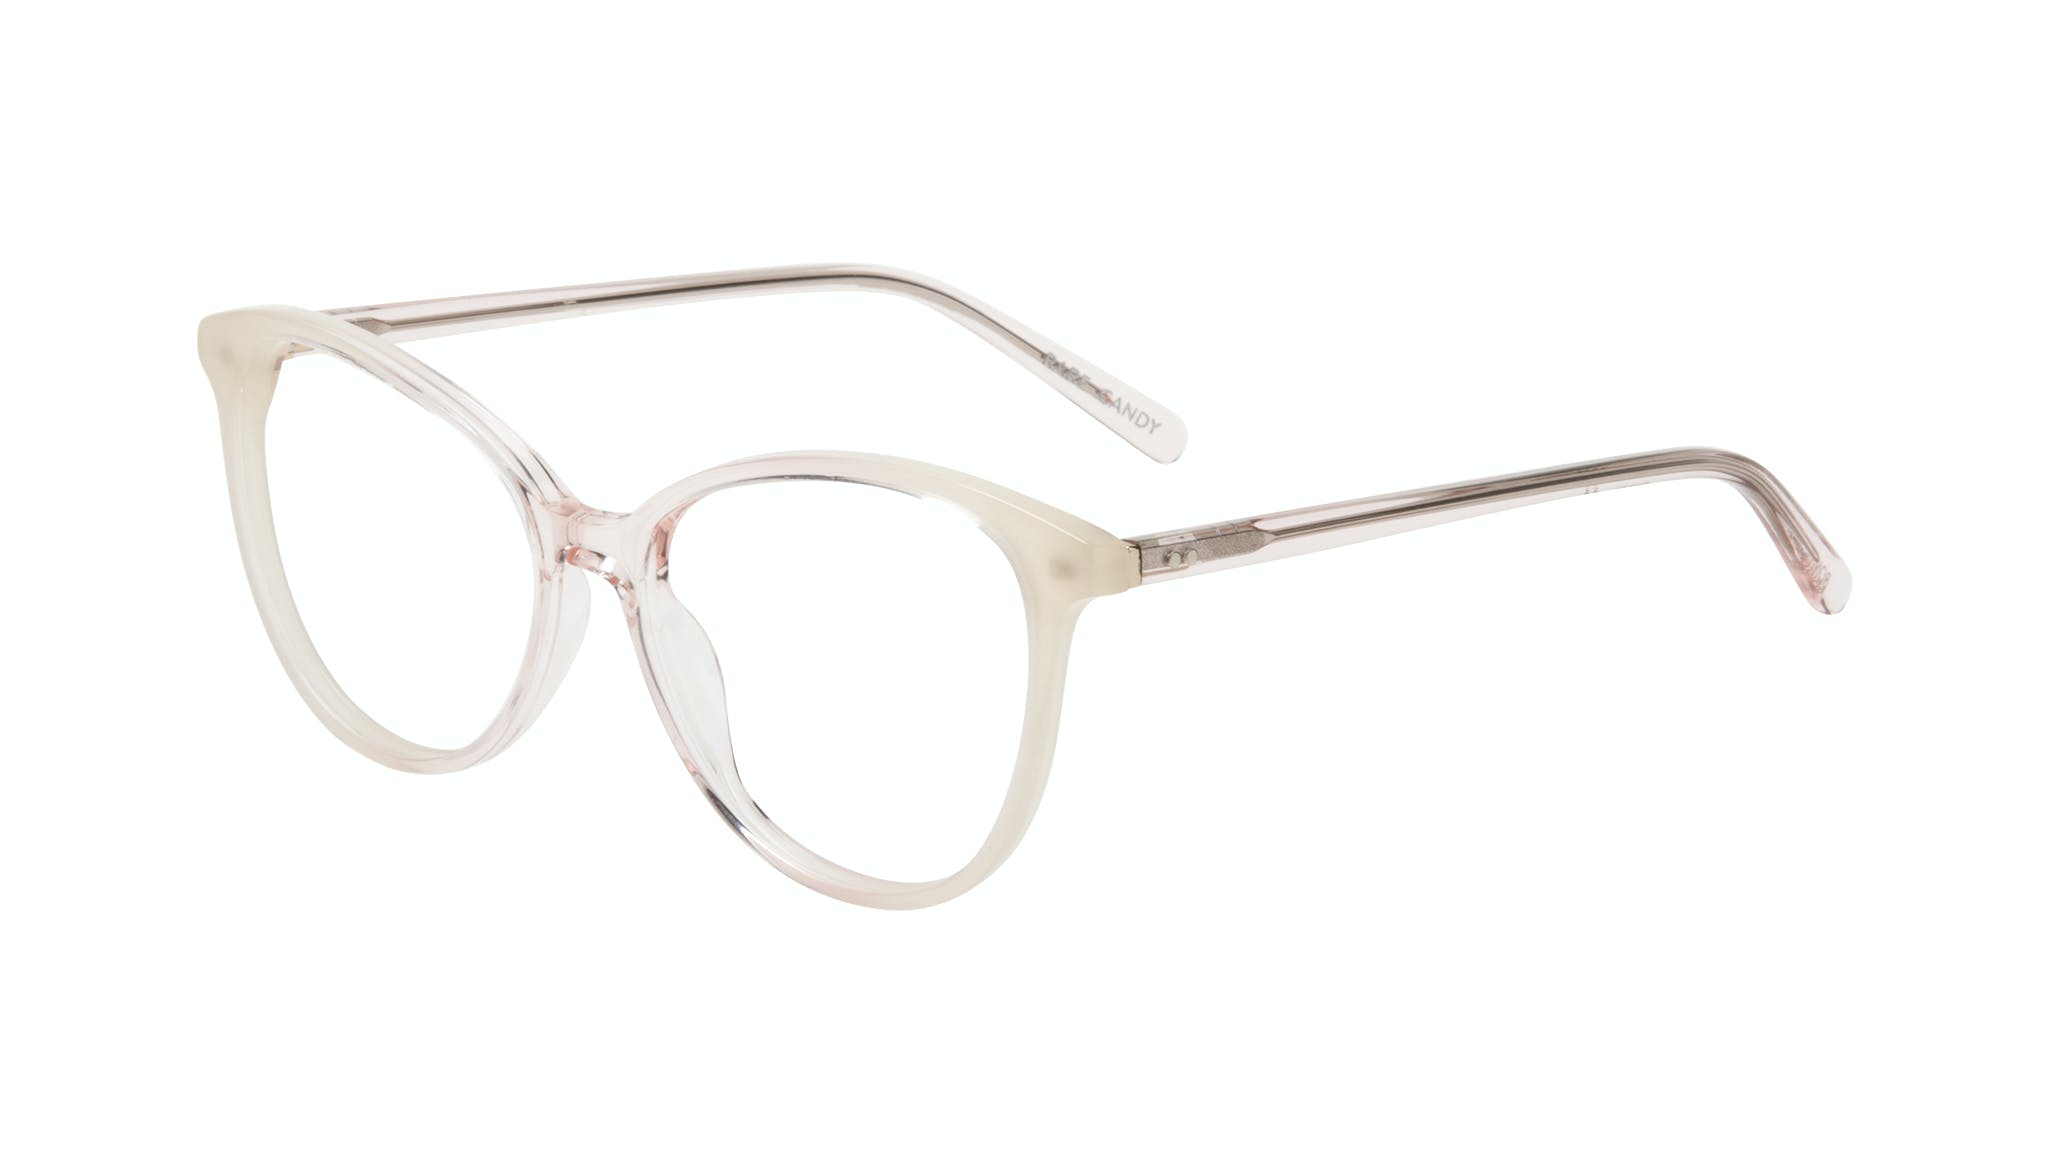 Affordable Fashion Glasses Cat Eye Eyeglasses Women Rare Candy Tilt